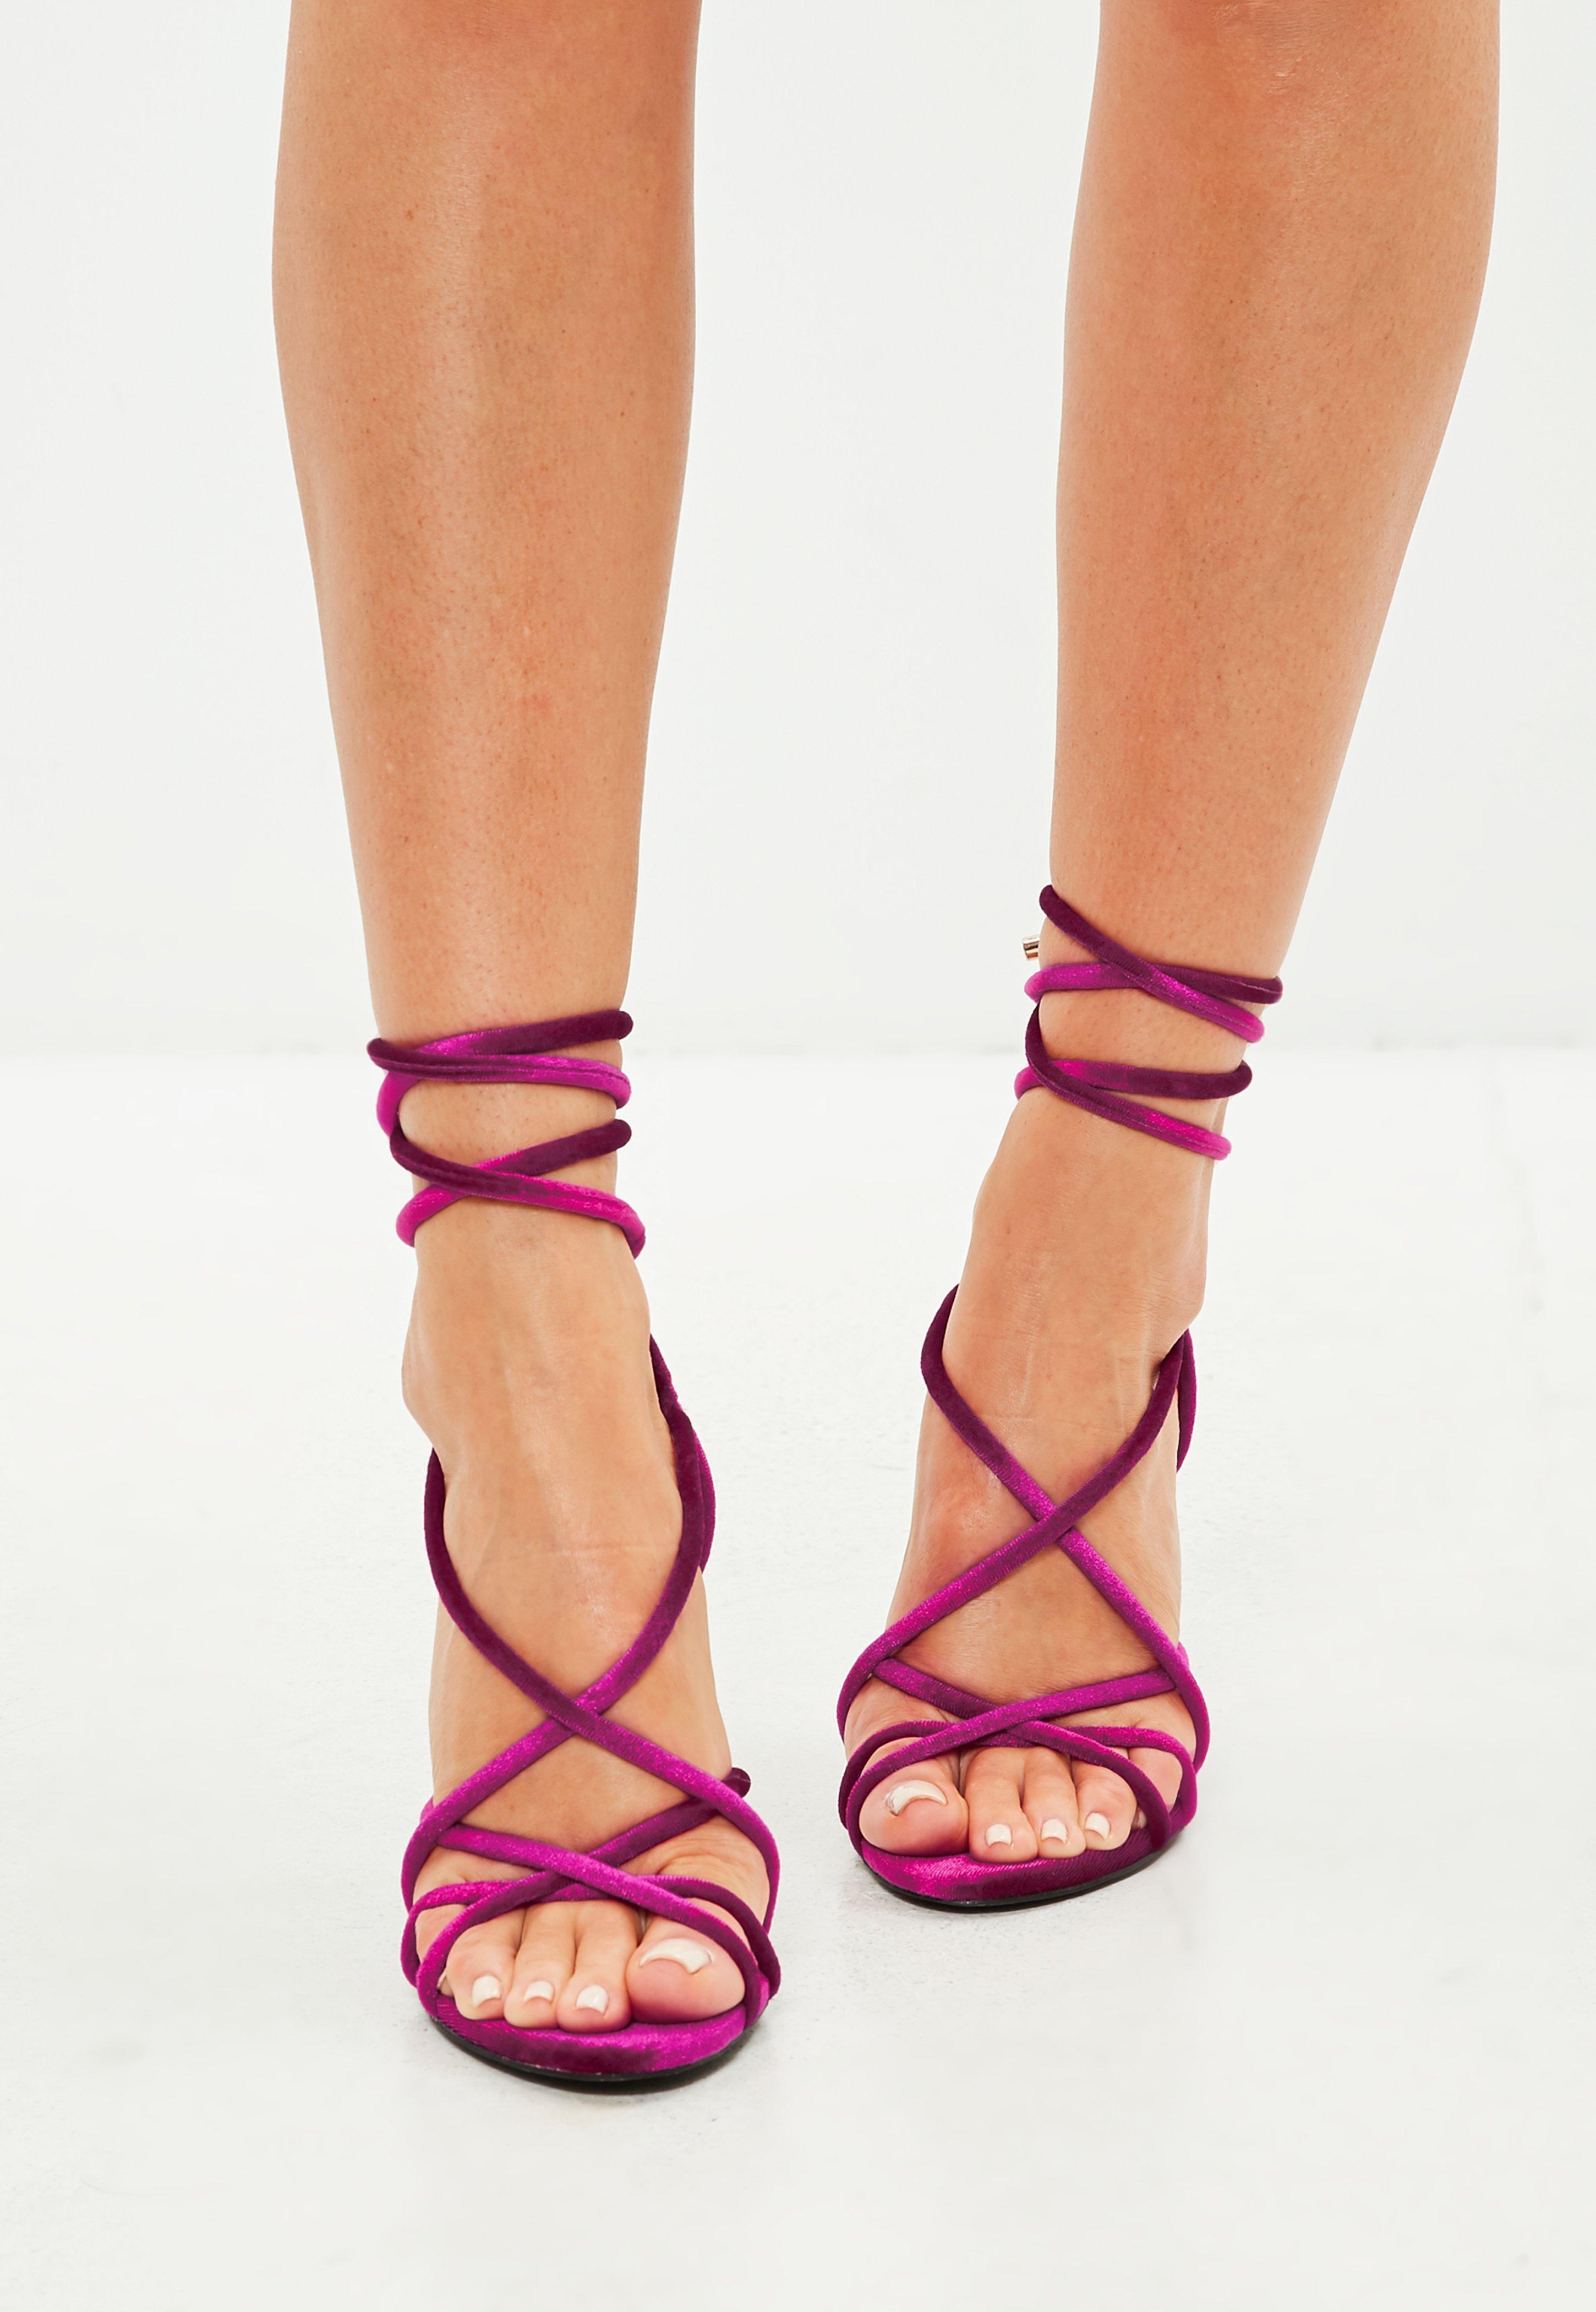 ff2d32659c8b0 Lyst - Missguided Pink Velvet Multi Strap Block Heel Sandals in Pink